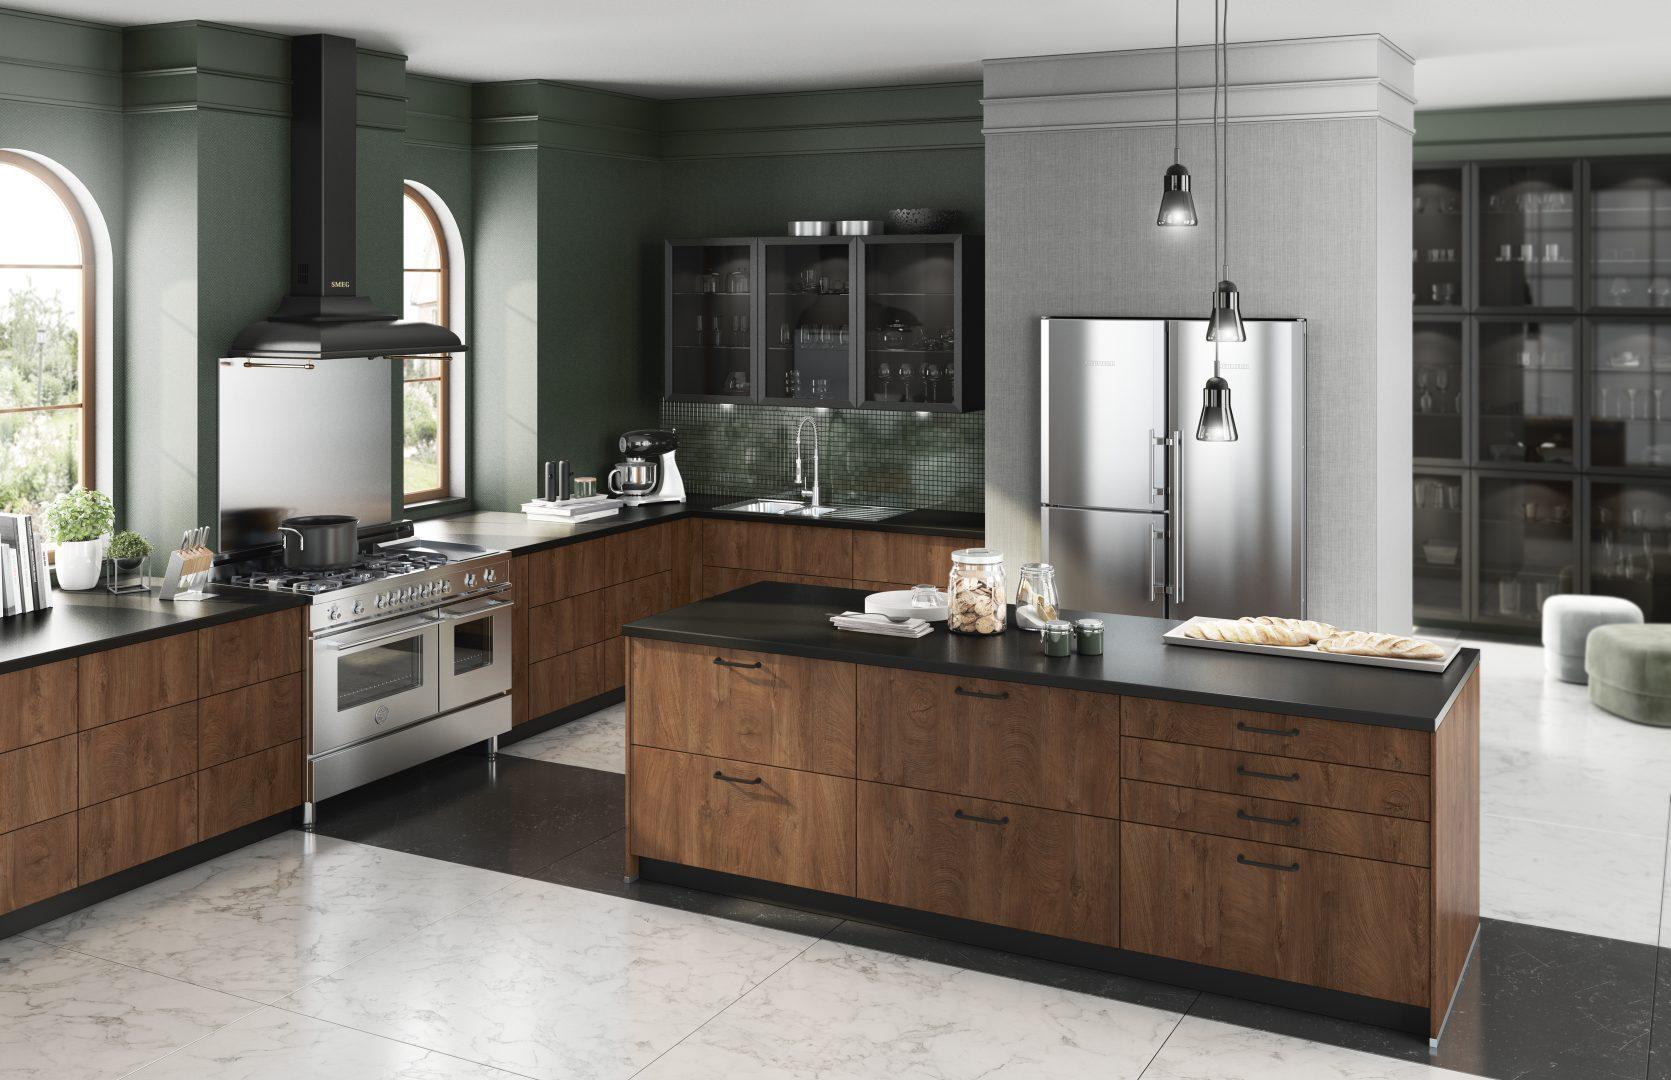 Bauformat-Küche-Holz-Dunkel